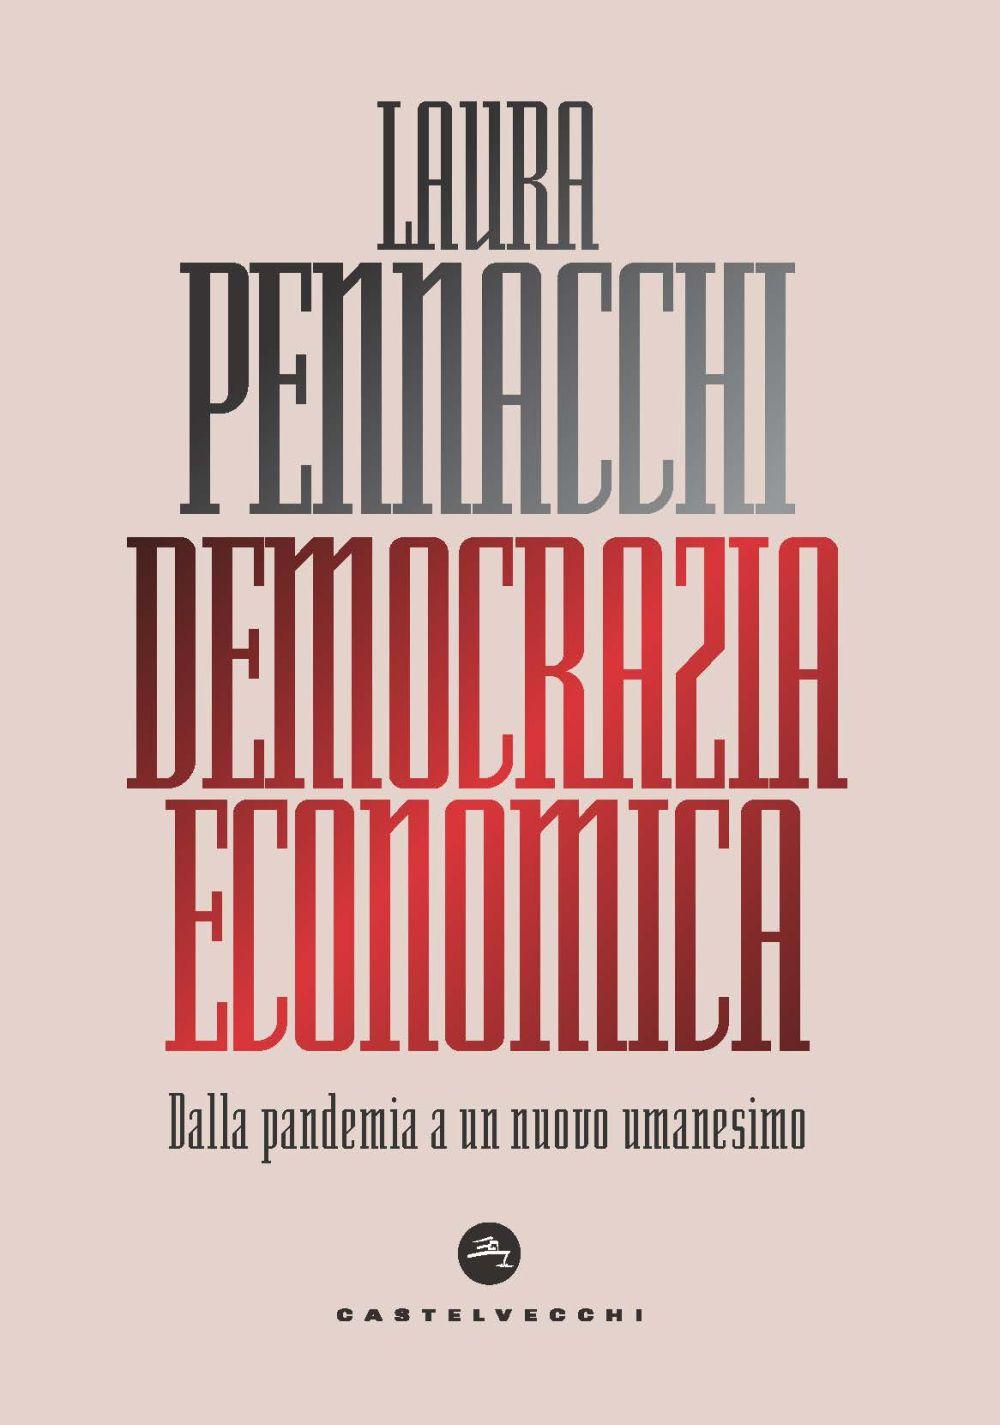 DEMOCRAZIA ECONOMICA - Pennacchi Laura - 9788832902631